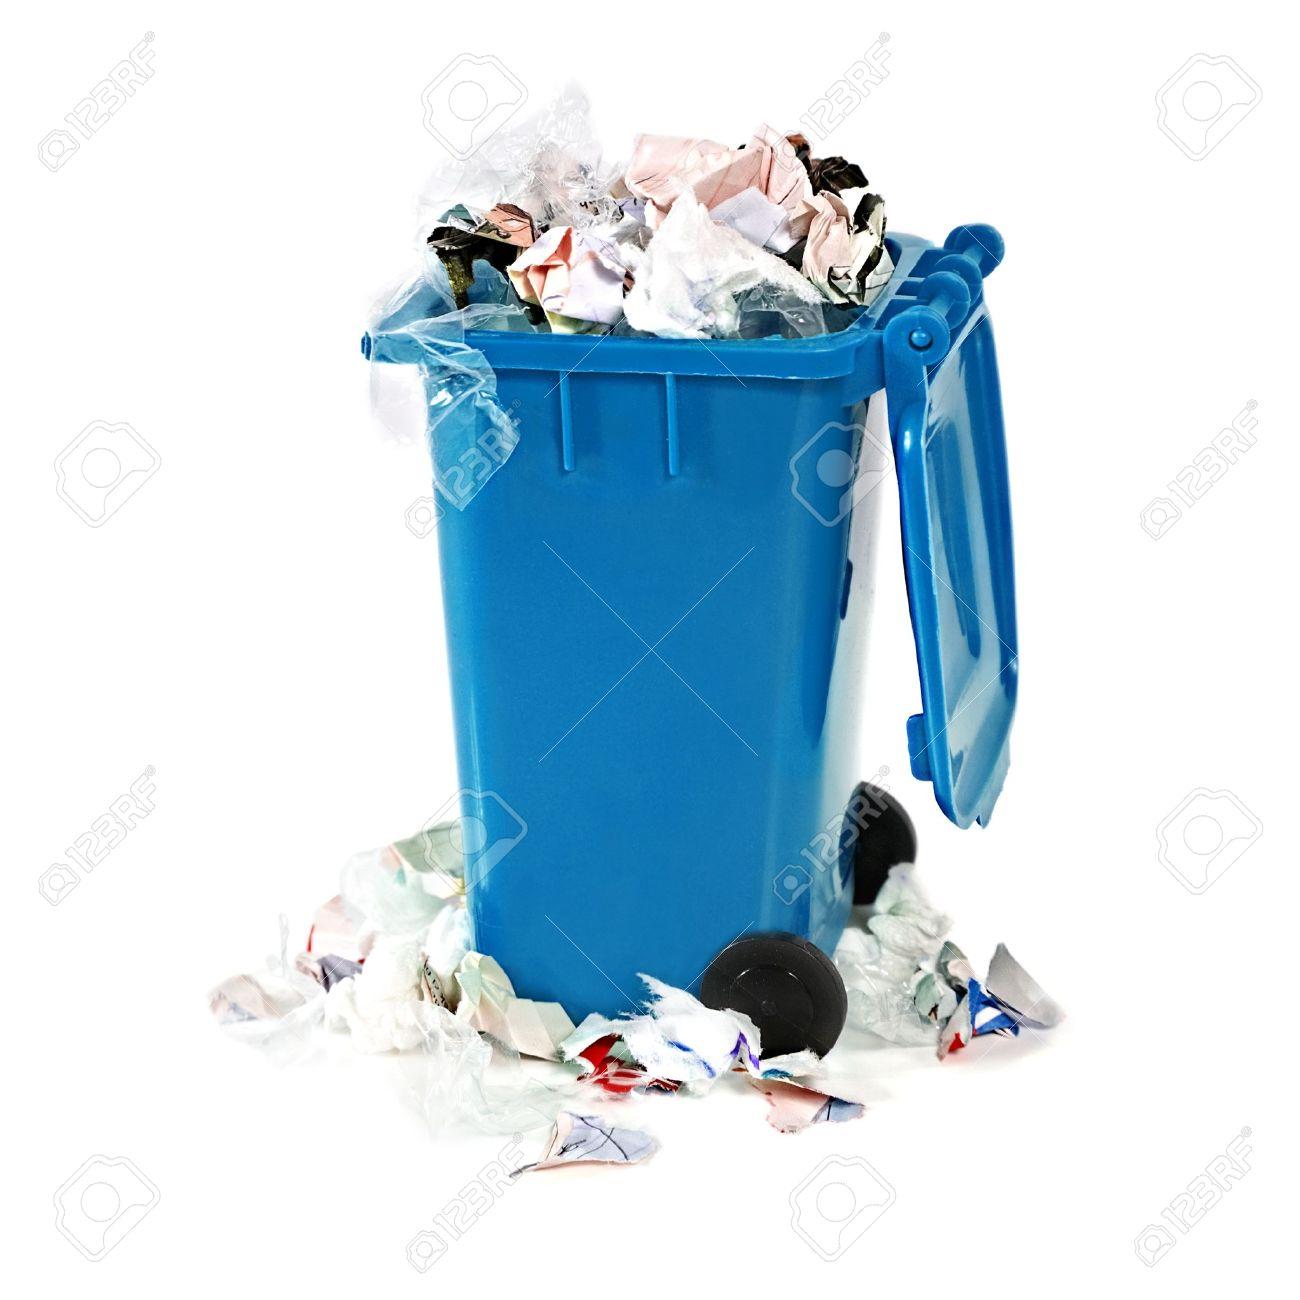 garbage bin overflowing blue garbage bin stock photo